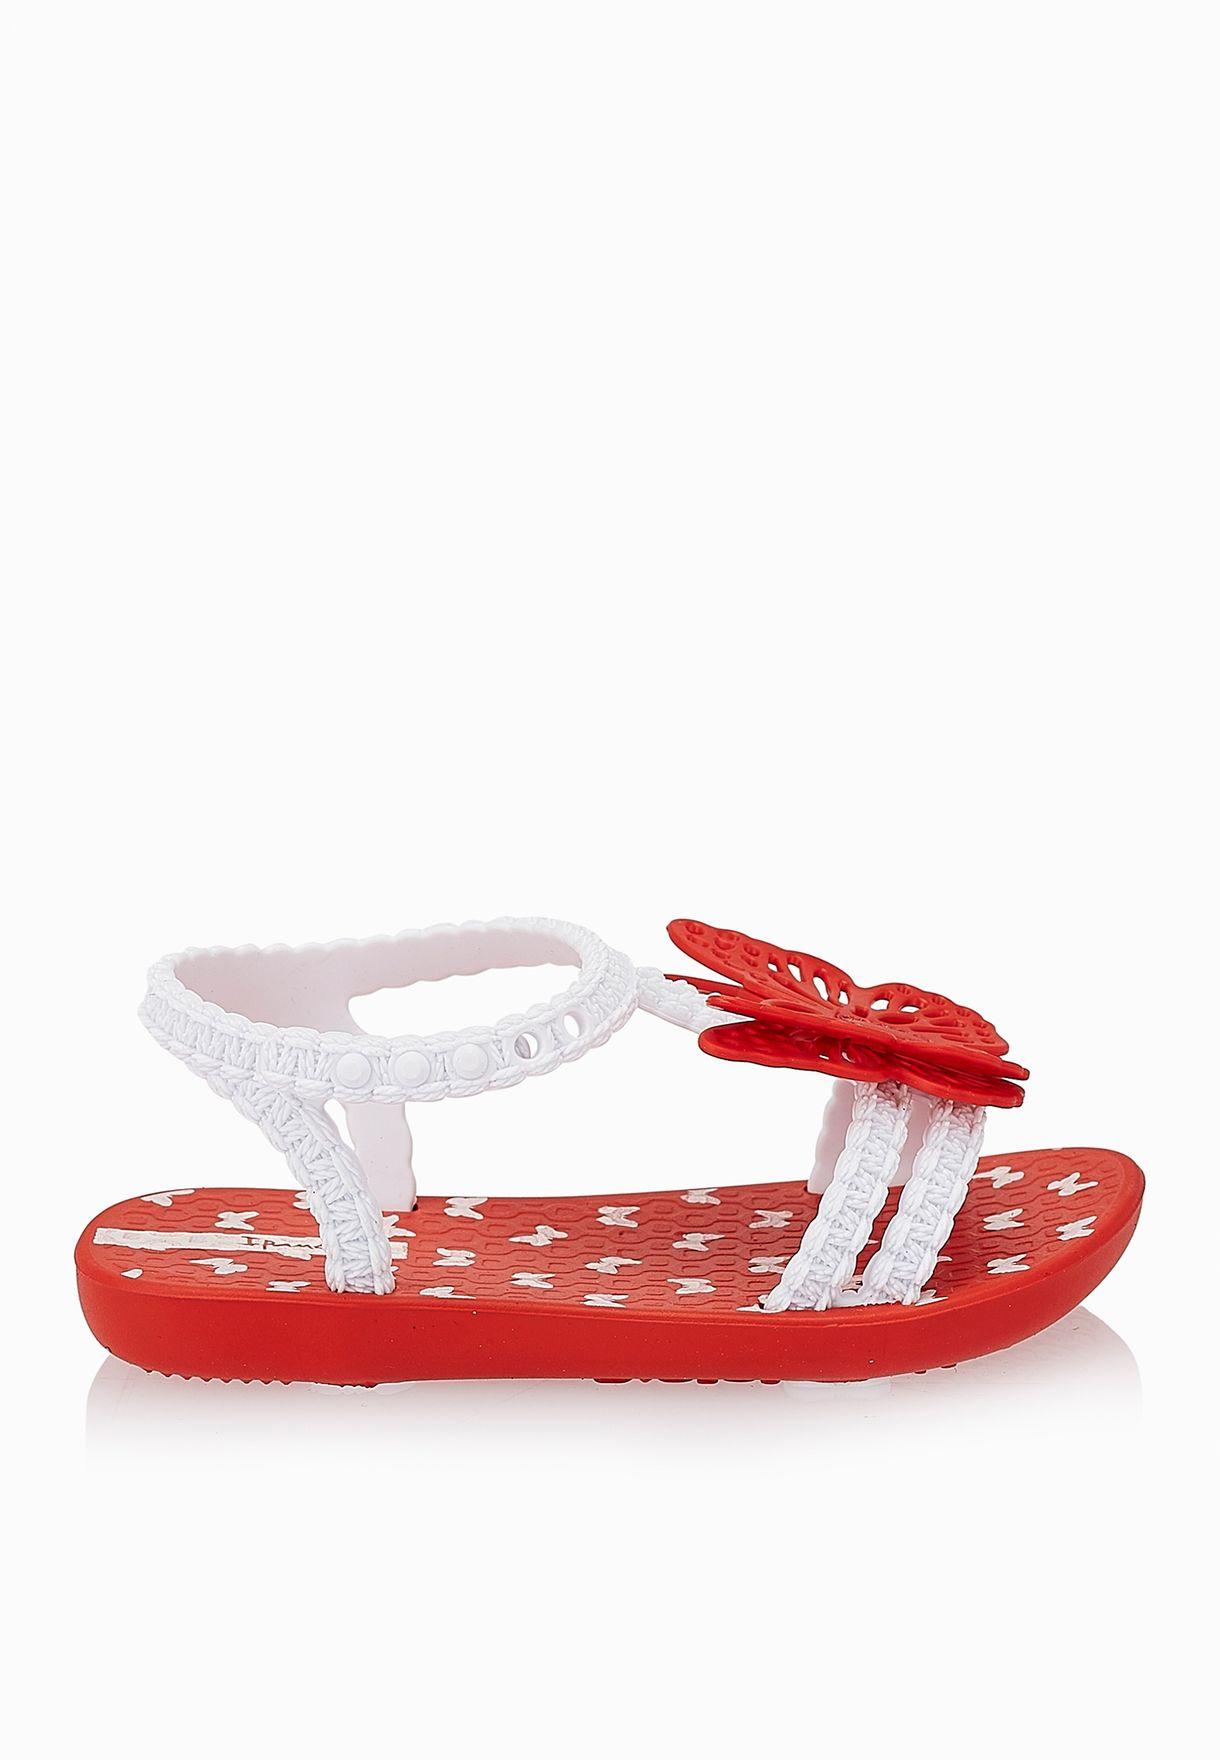 6118330cb87 Ipanema Butterfly Flip Flops - Best Image Of Butterfly Imagevet.Co